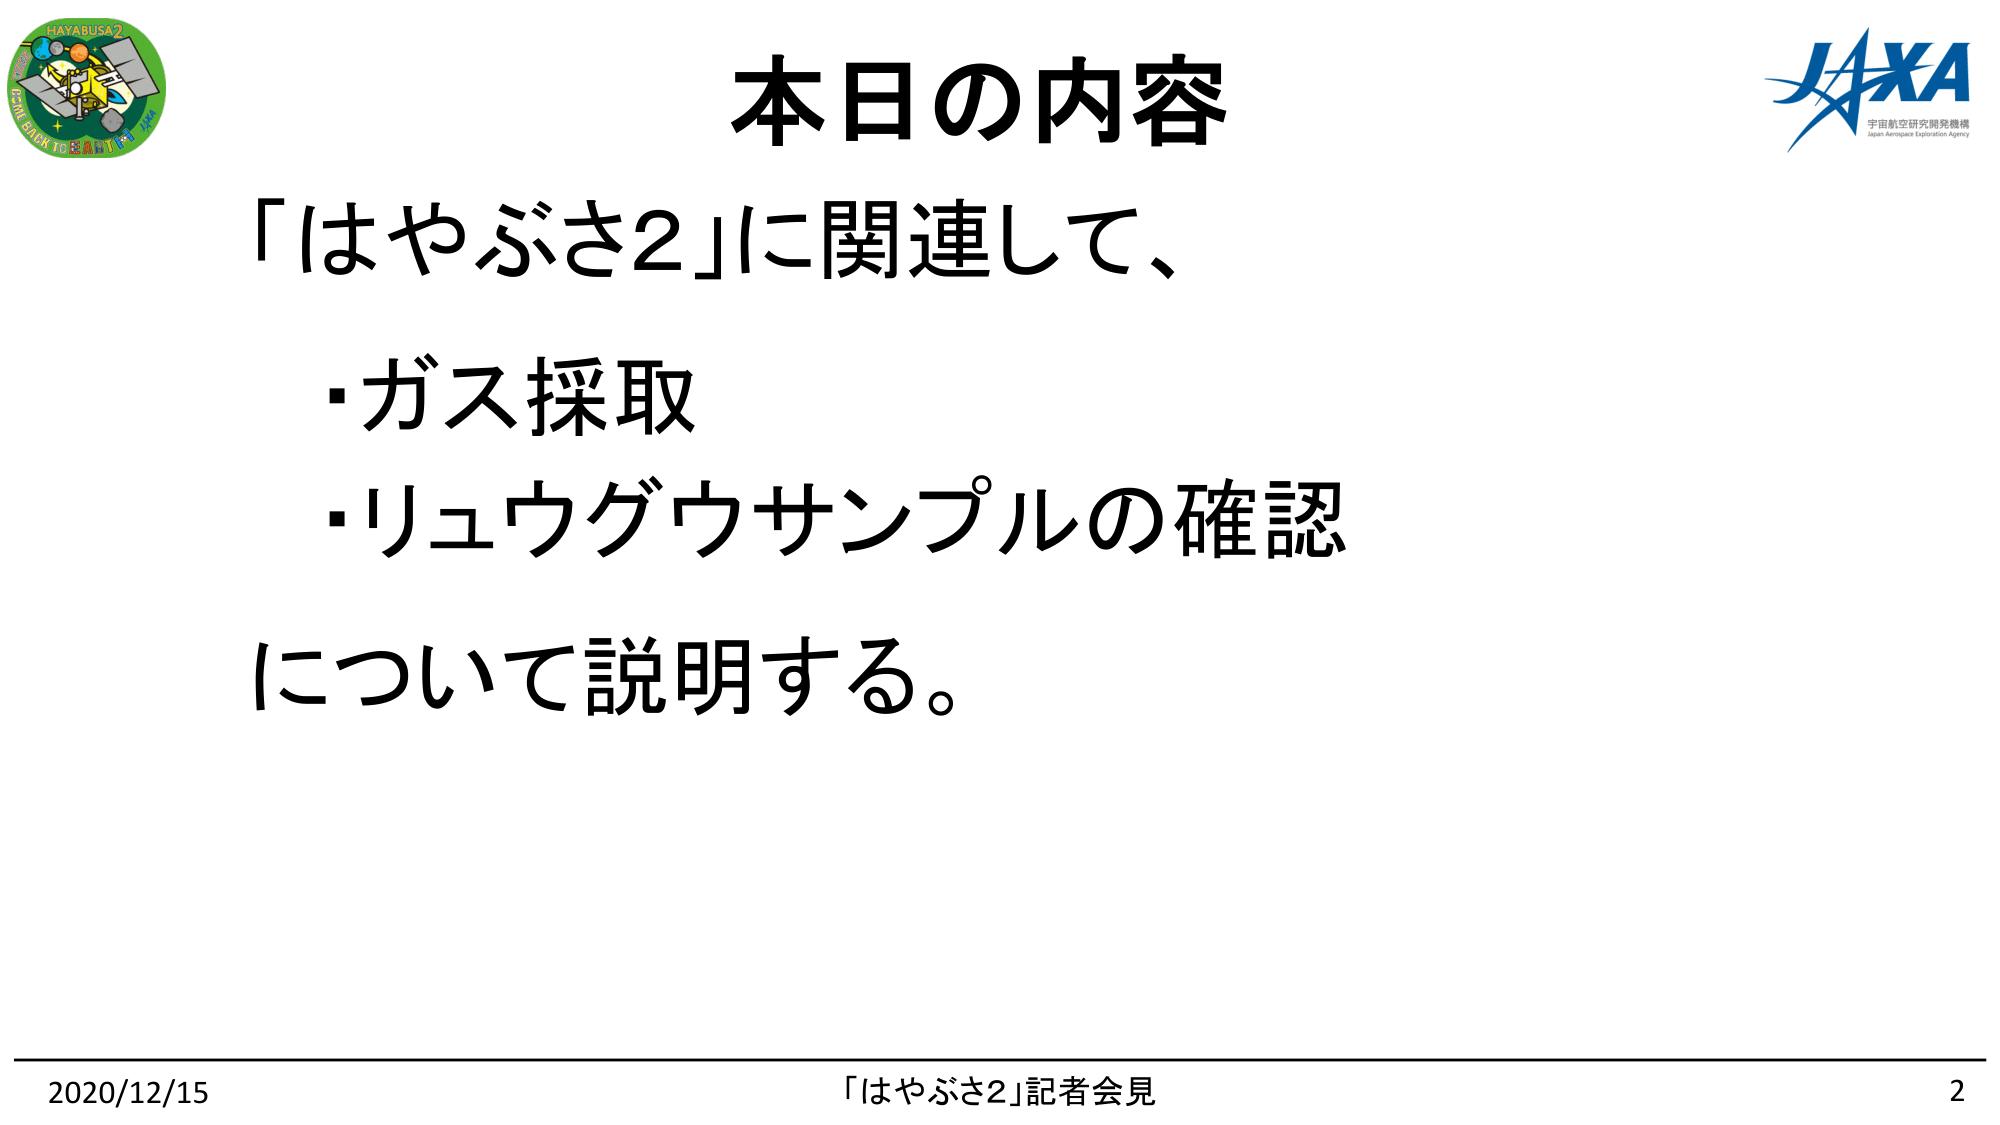 f:id:Imamura:20201215131953p:plain